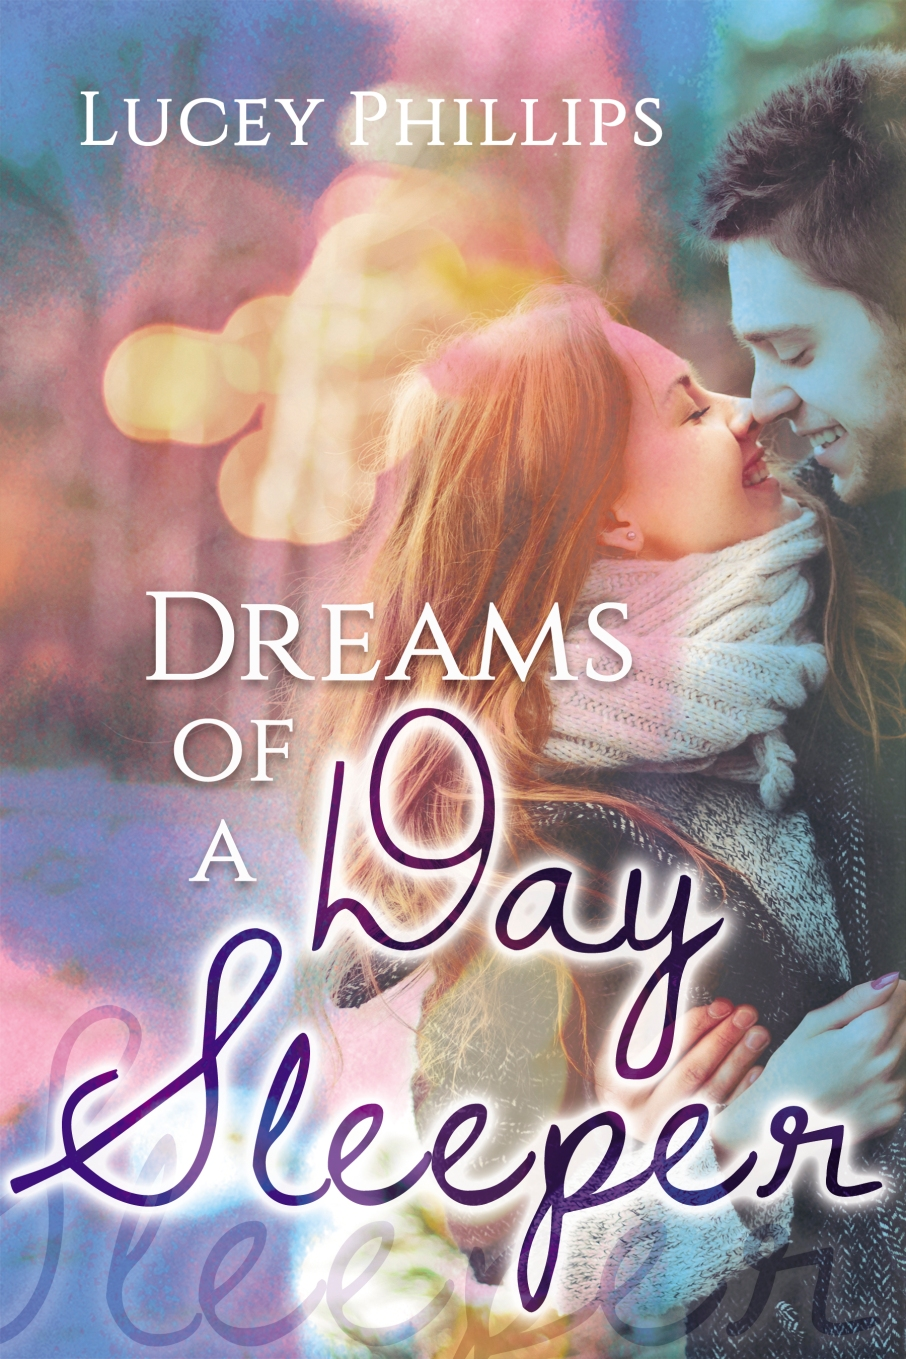 Dreams of a Day Sleeper_2